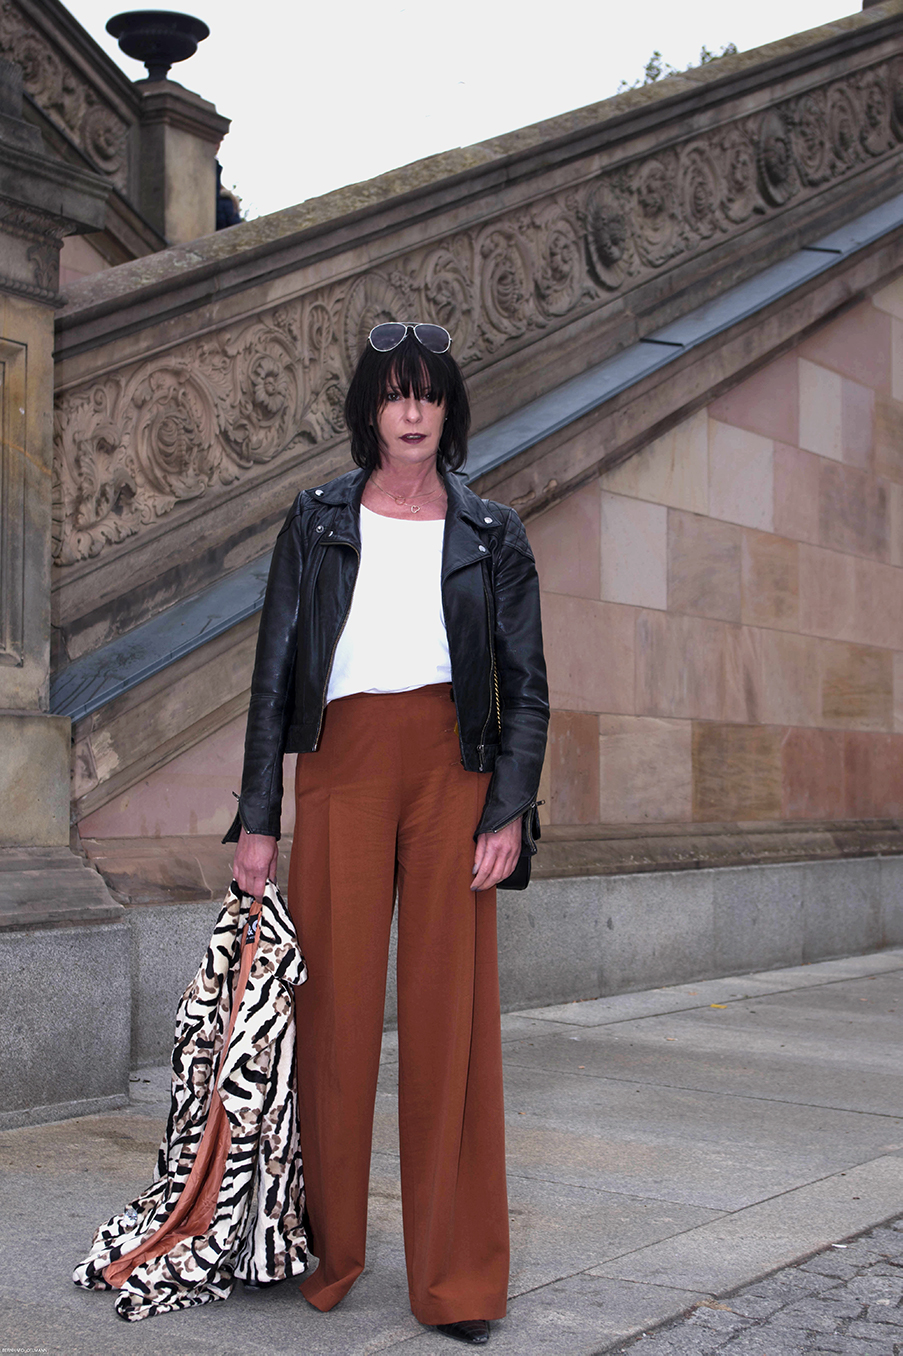 Just-take-a-look Berlin - Internetpräsenz - Outfit Museumsinsel-15.1